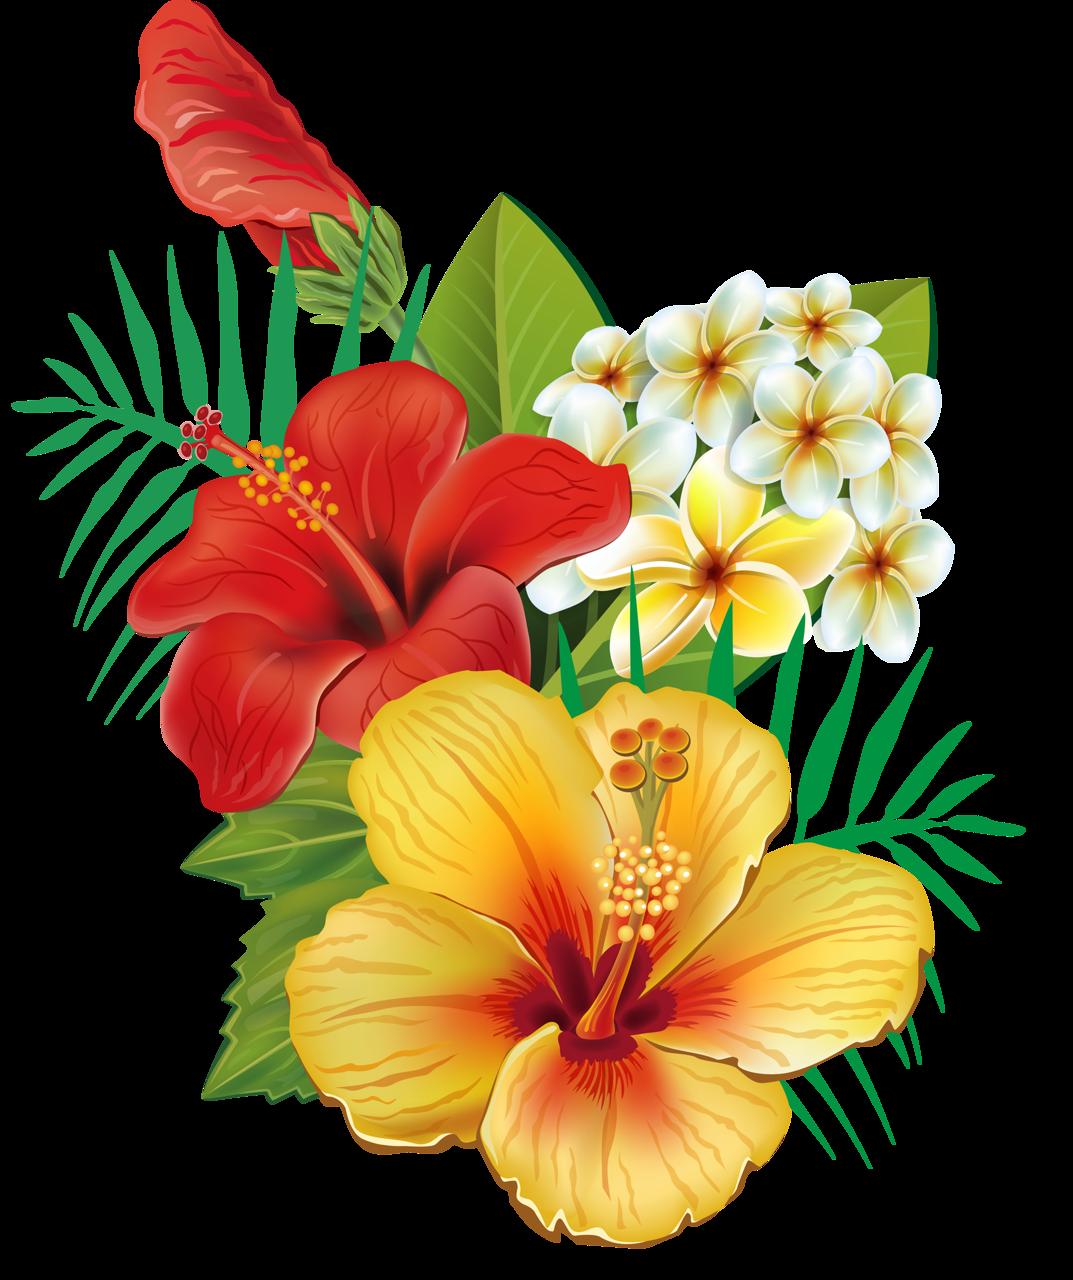 soloveika flores hibisco net soloveika butterfly flowersflower artflower izmirmasajfo Image collections